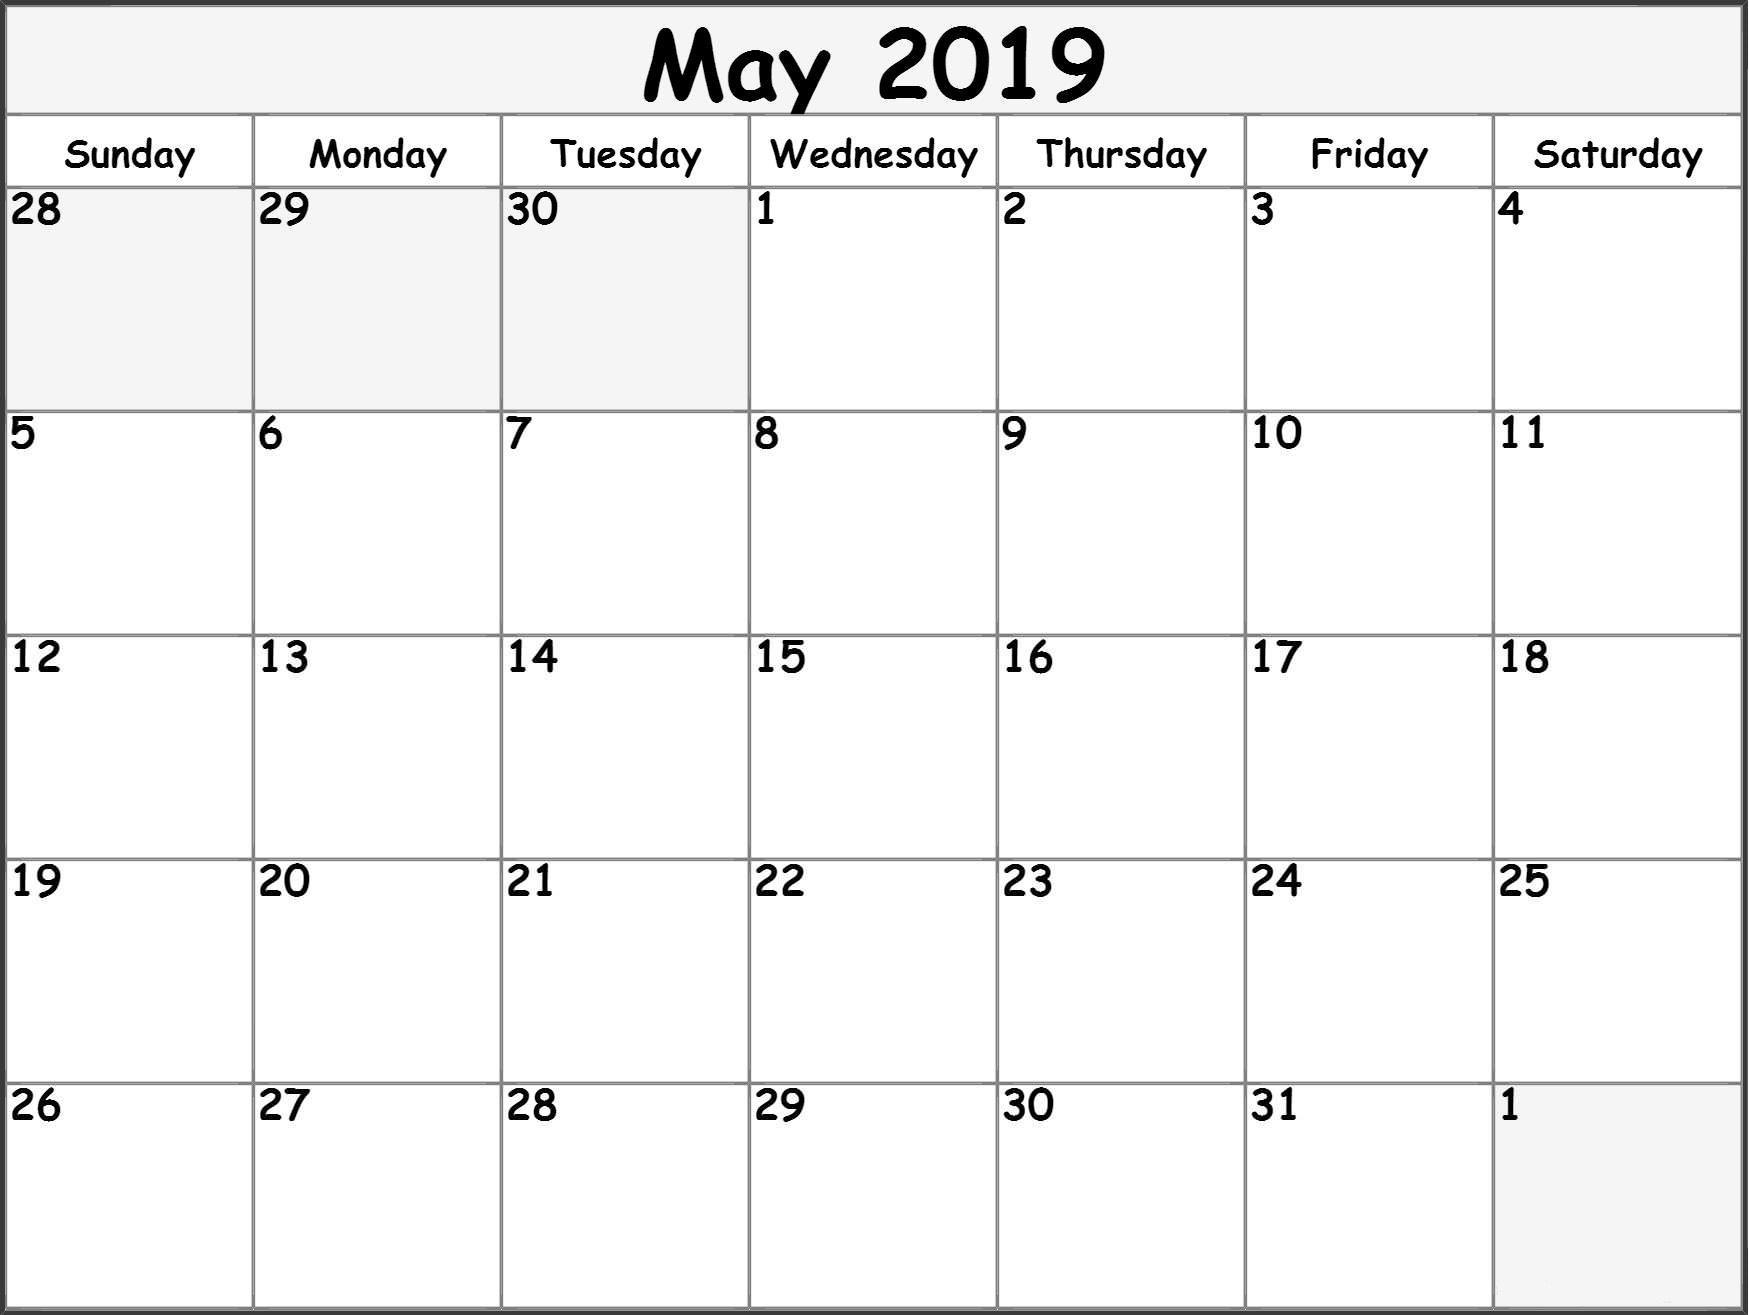 May 2019 Printable Calendar Templates - Free Blank, Pdf, Holidays_Calendar Blank Templates Free